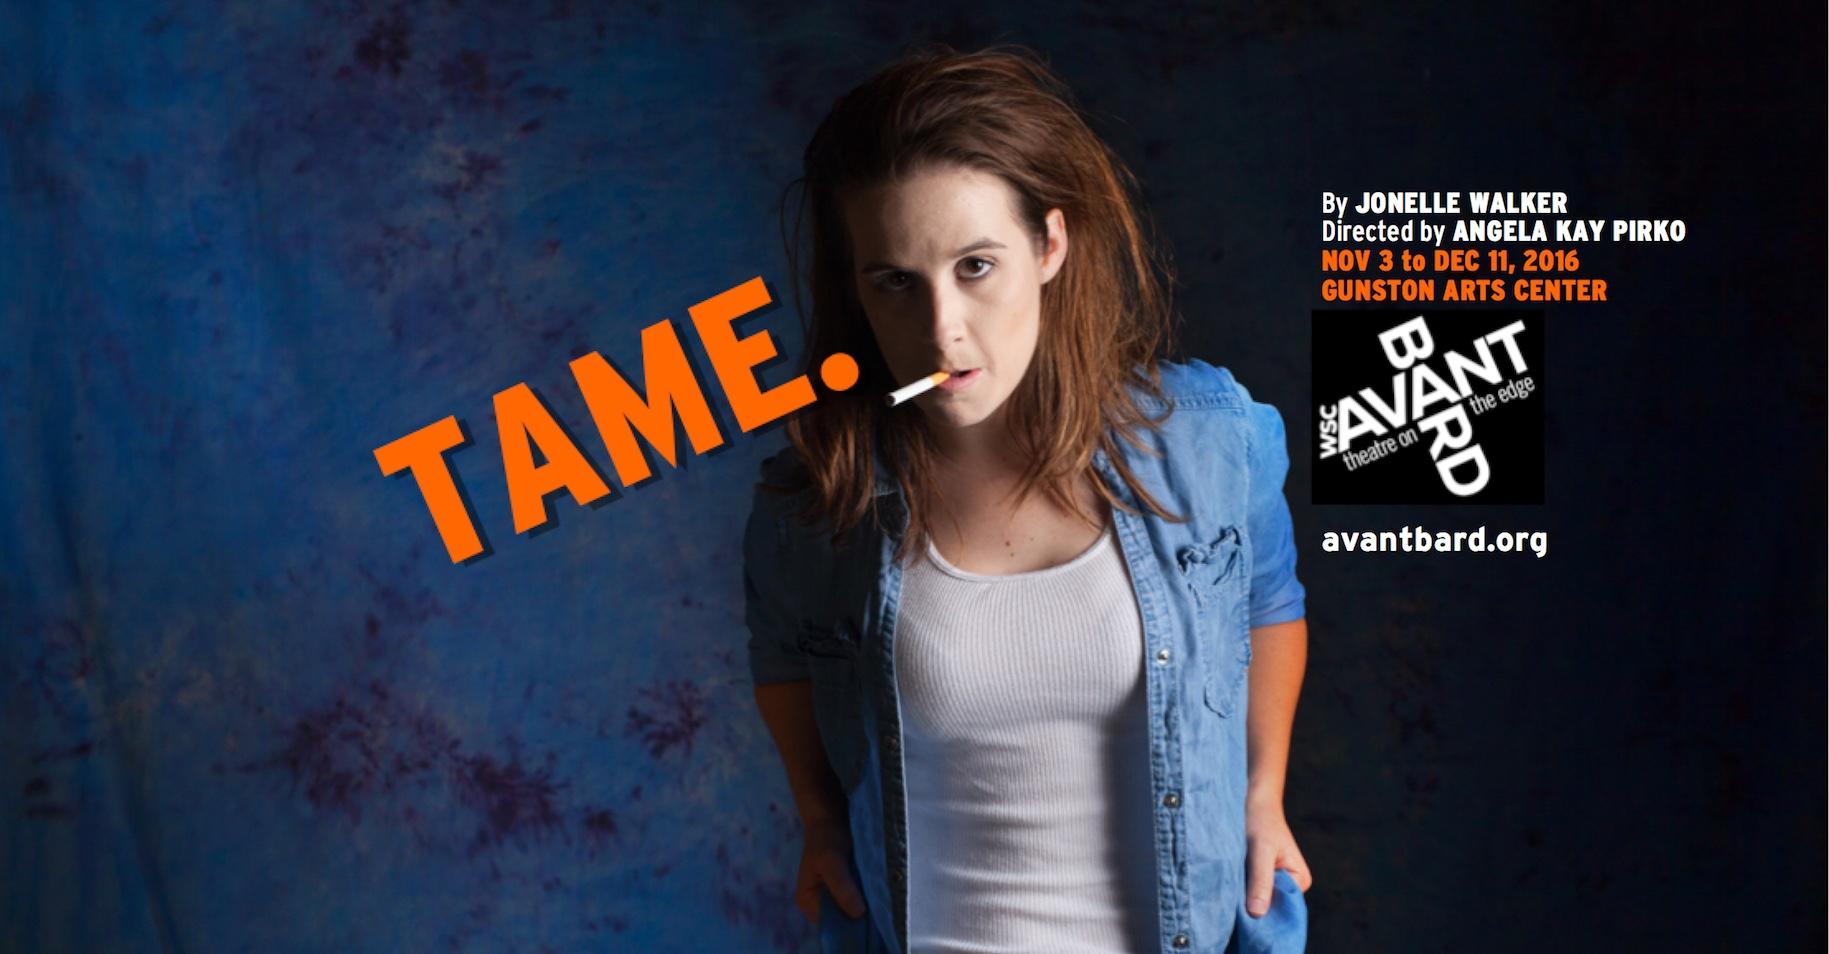 Tame Facebook cover photo.jpg